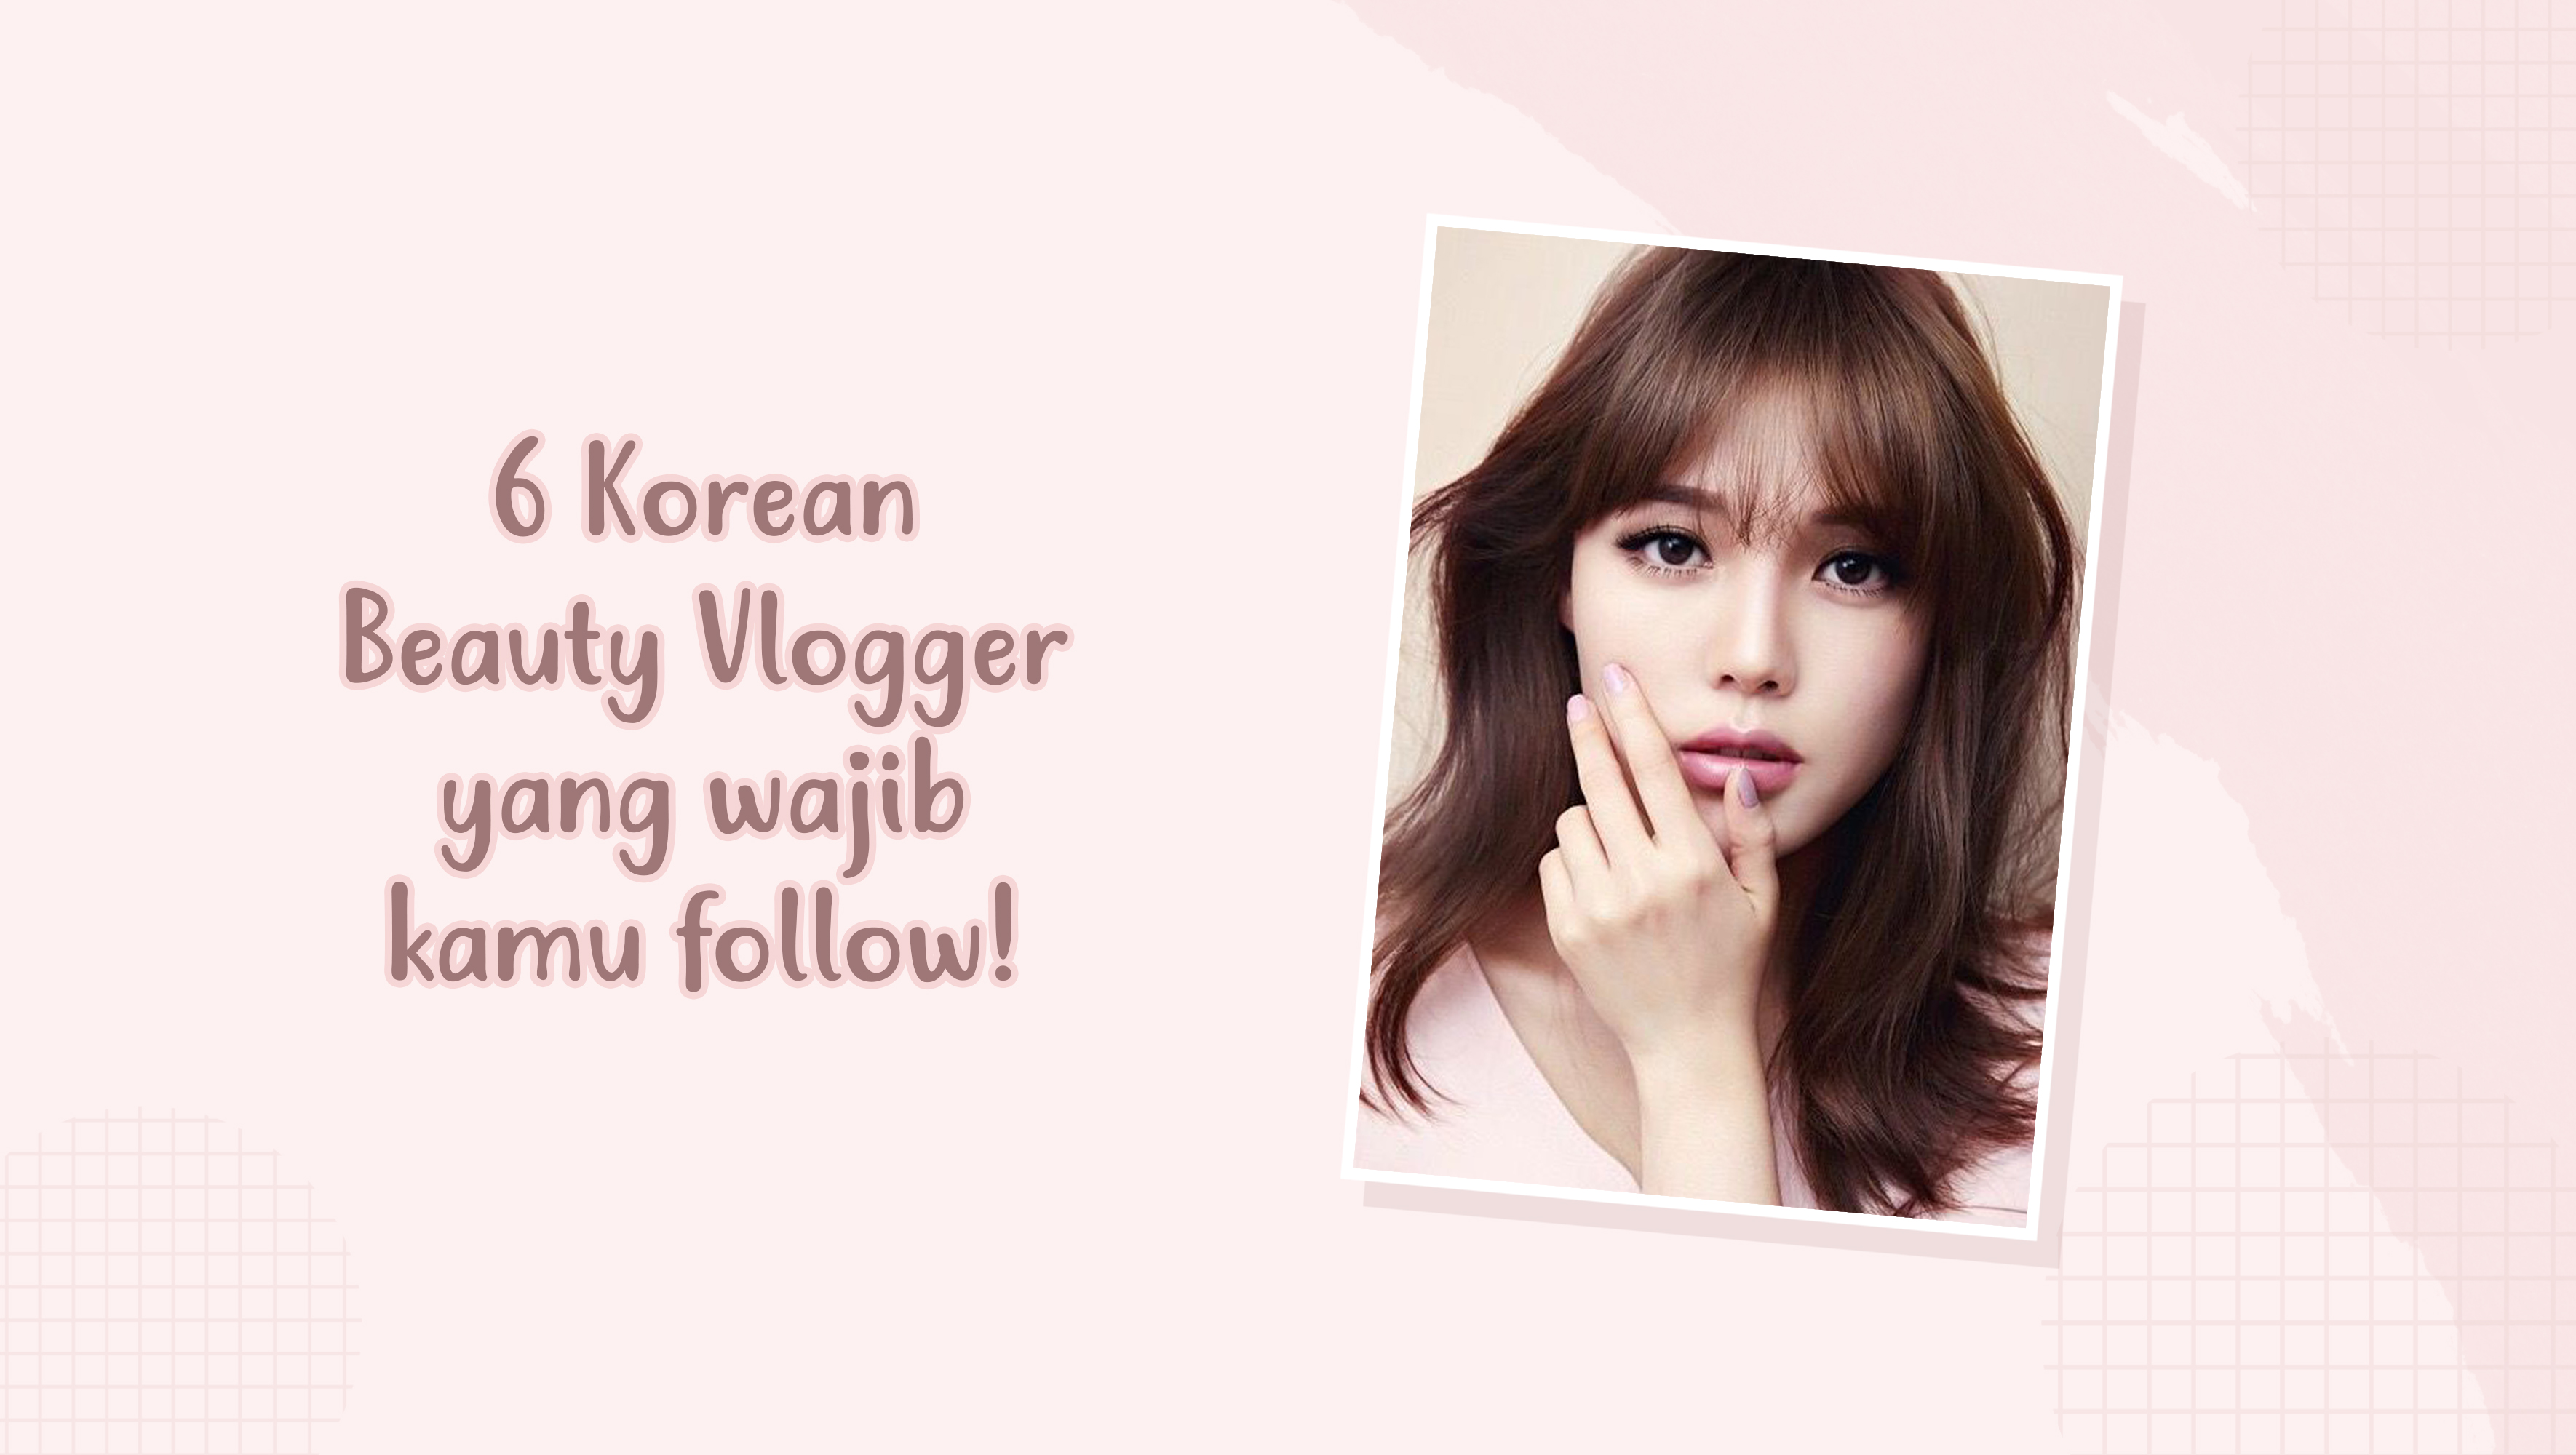 6 Korean Beauty Vlogger yang wajib kamu follow! image